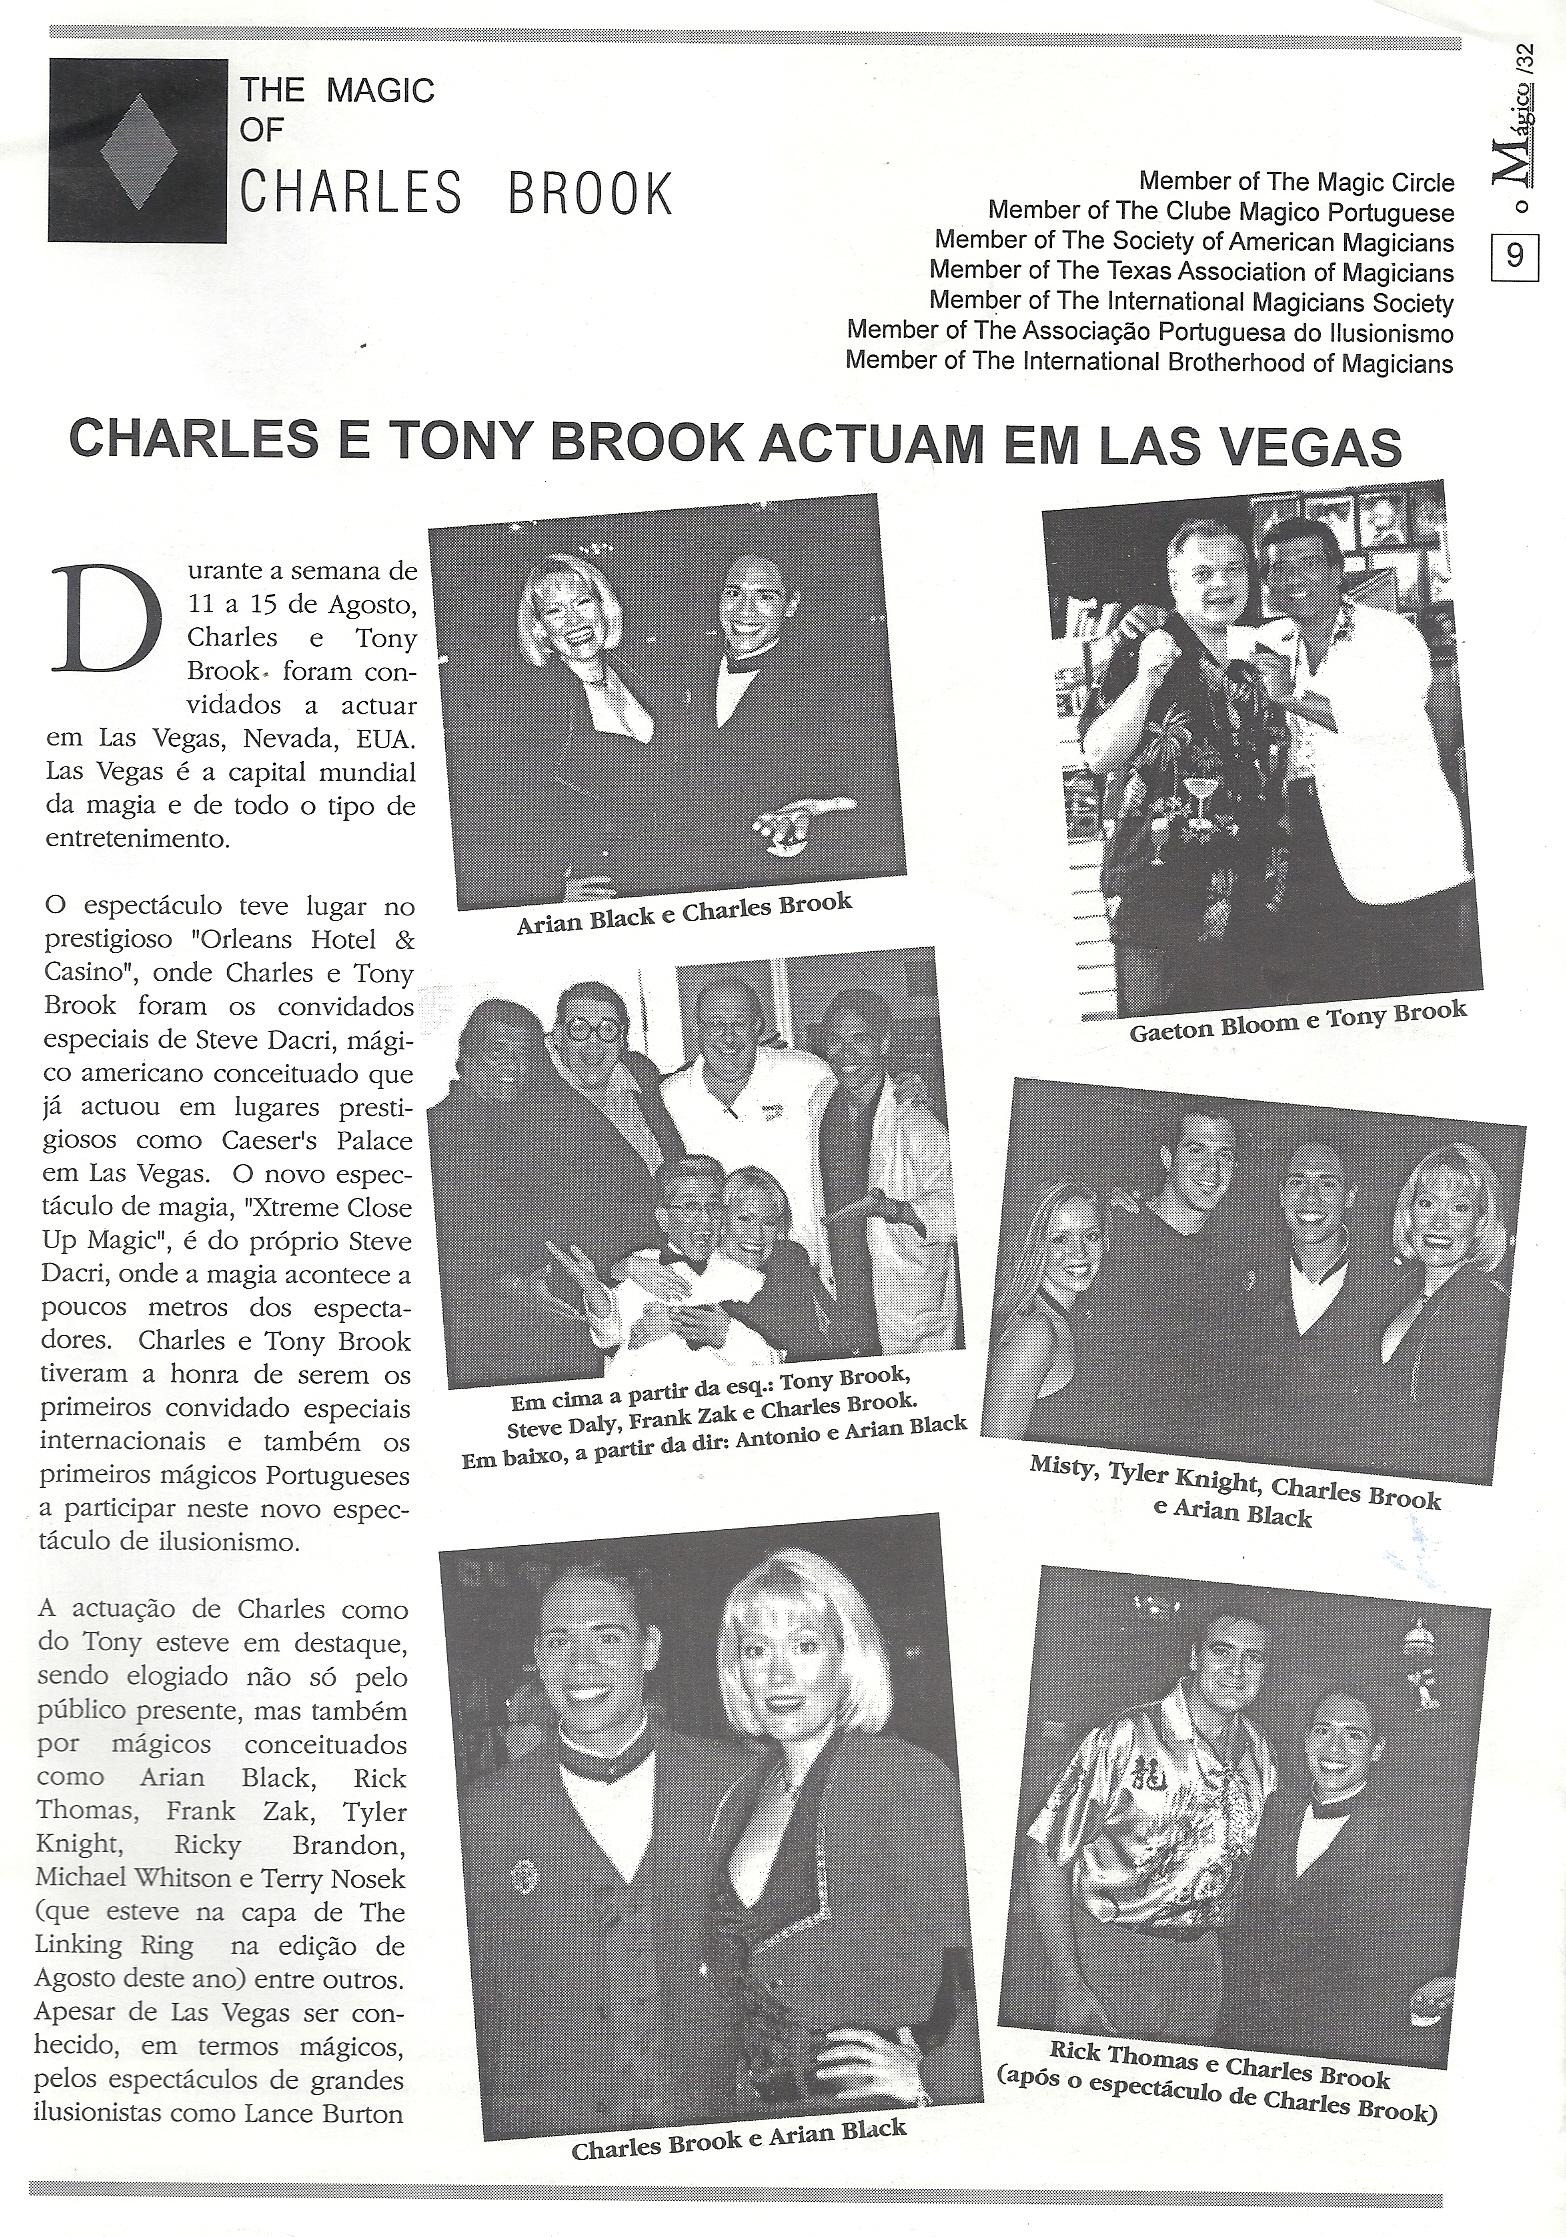 The Magic of Charles Brook